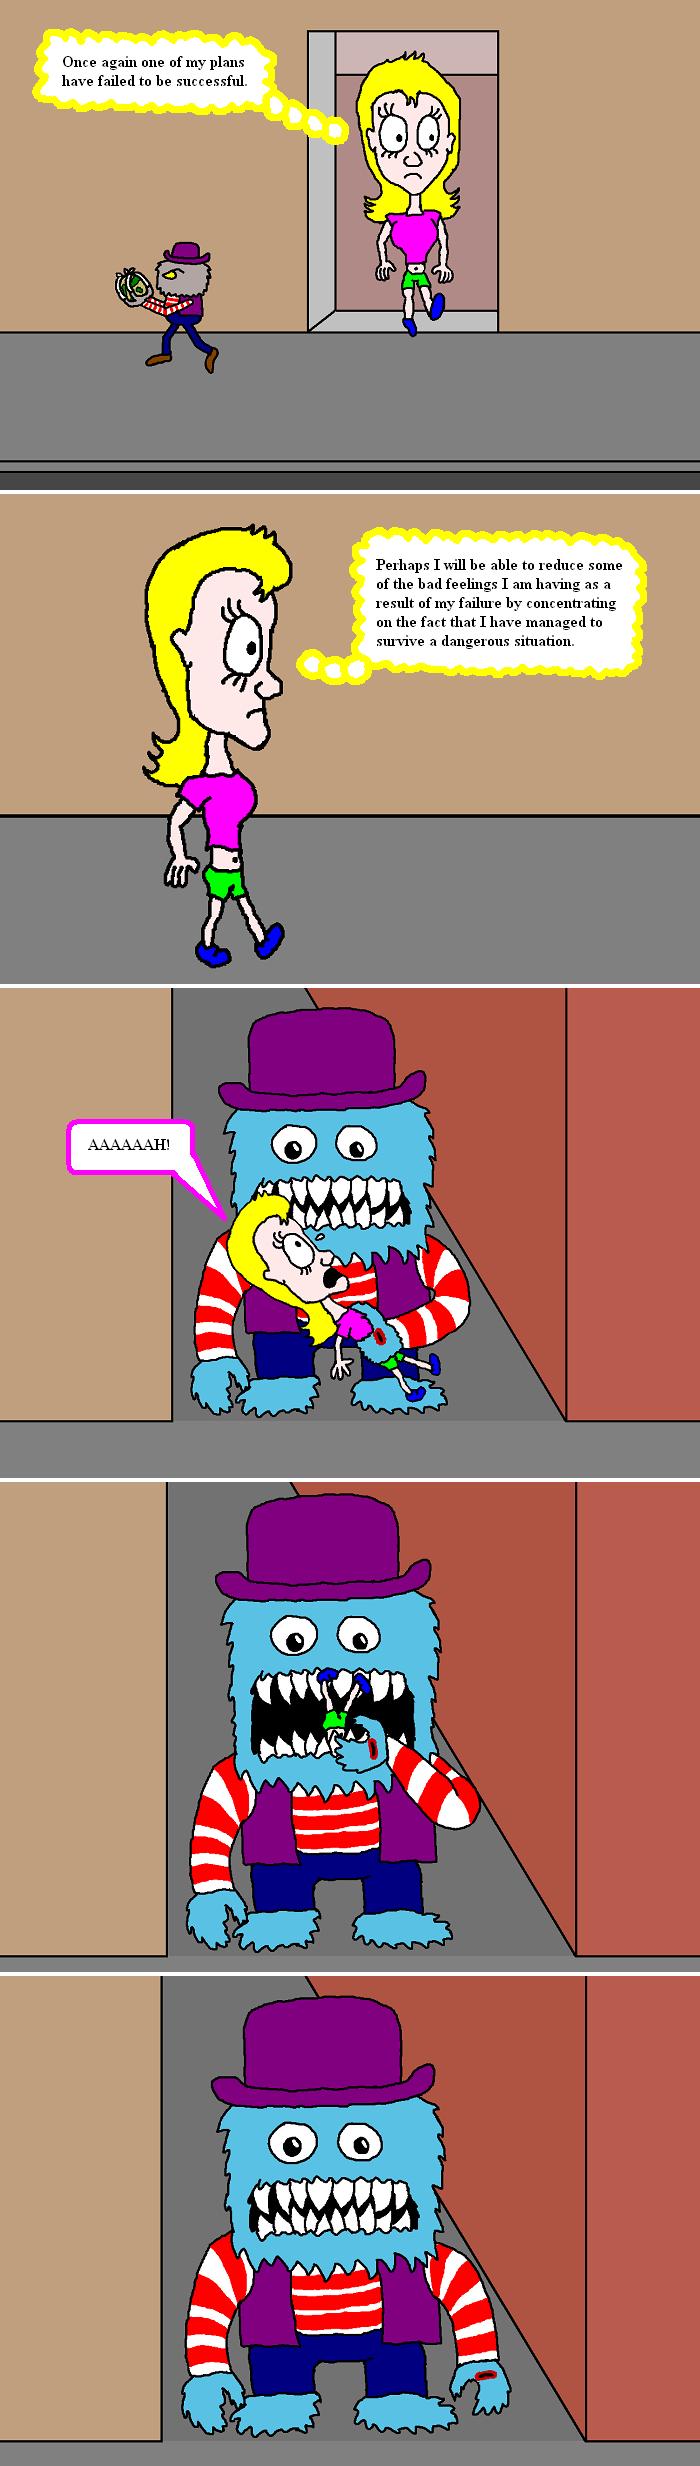 The tenth last strip